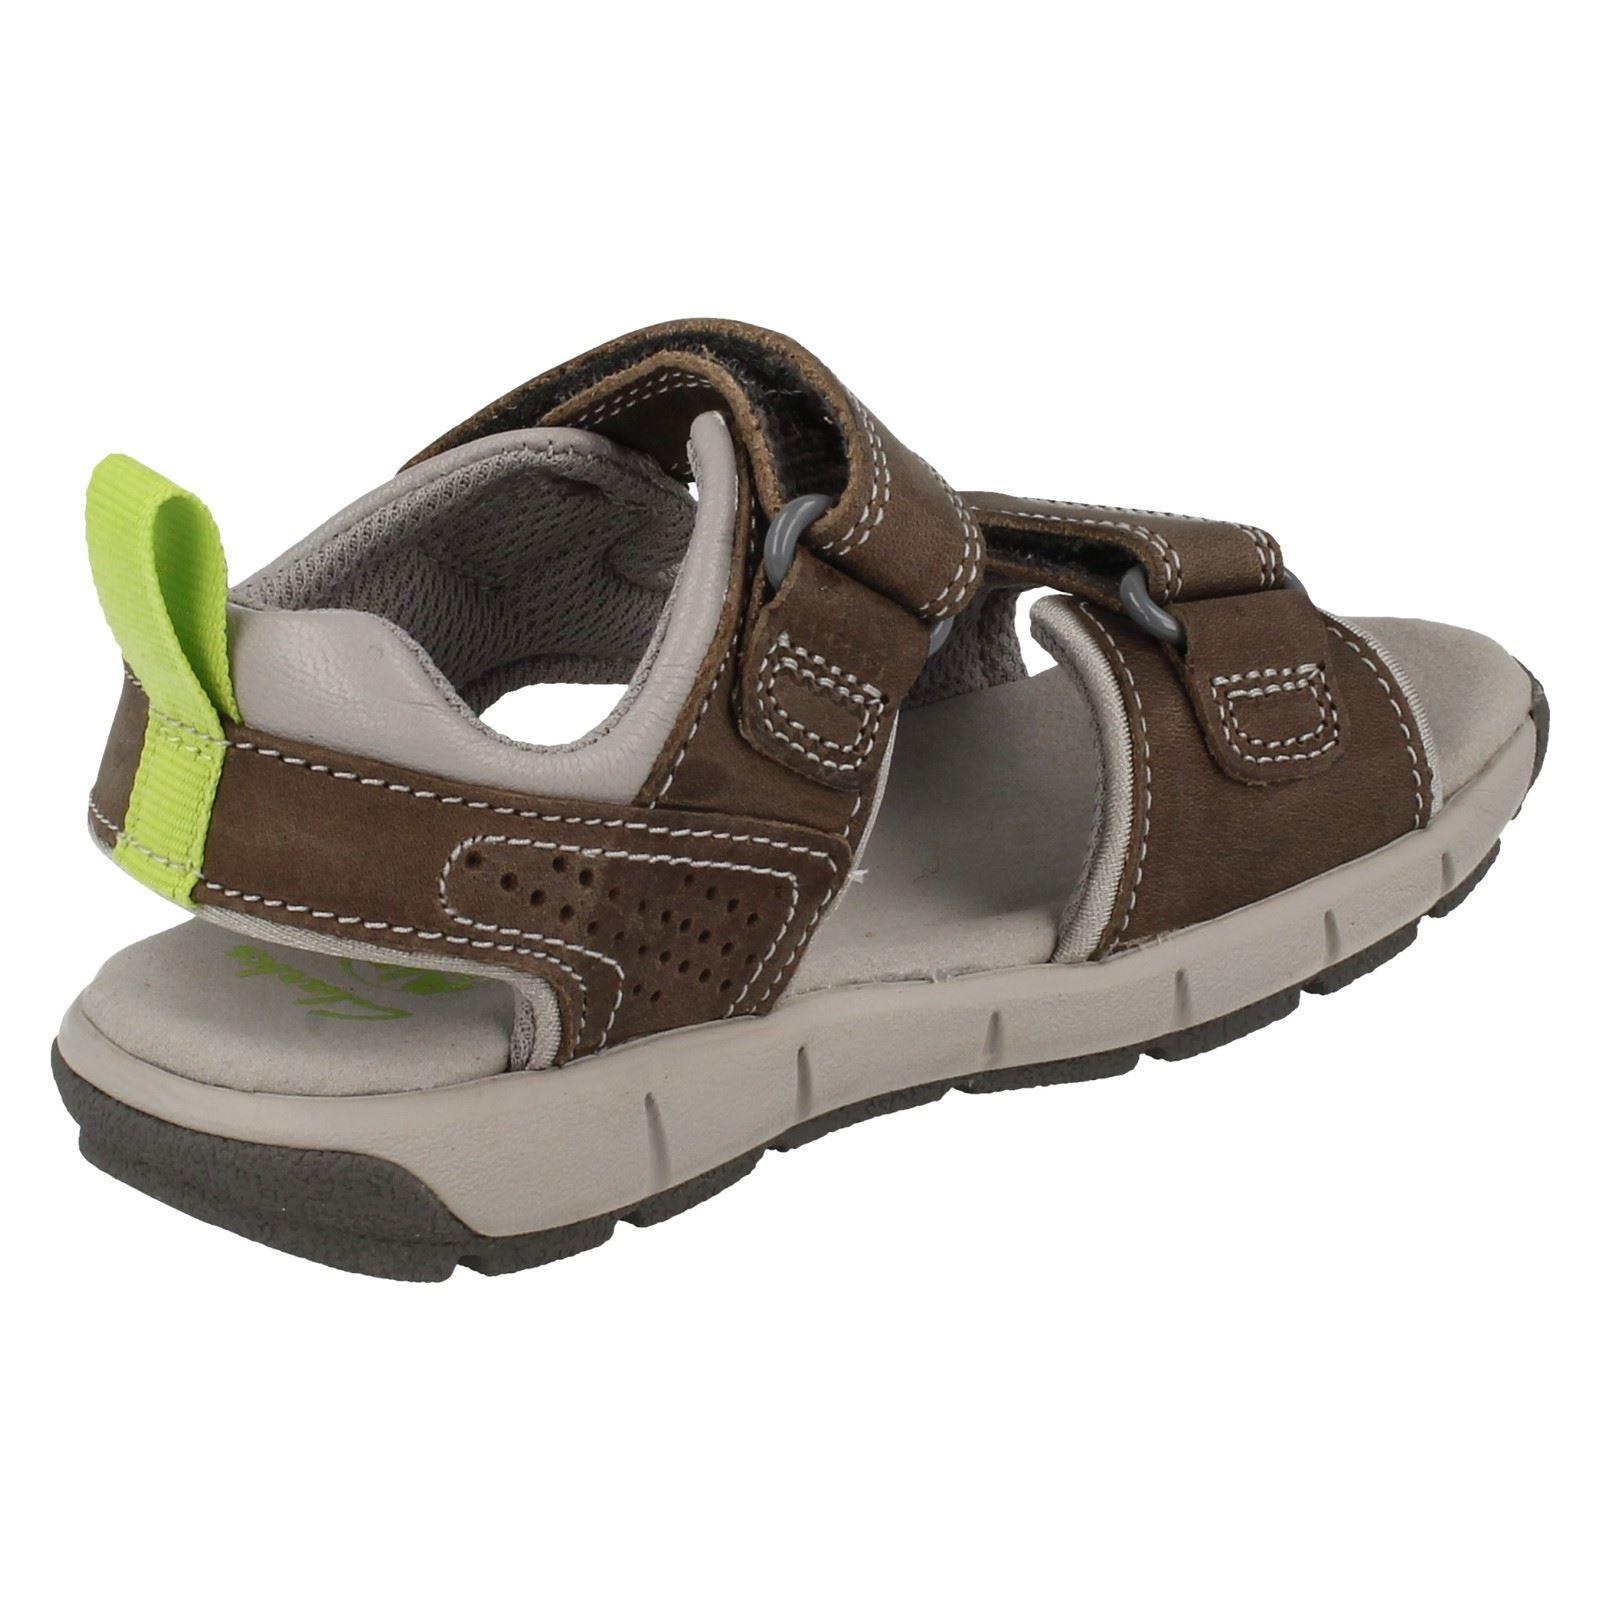 8c4d7143122 Infant-Junior-Boys-Clarks-Summer-Sandals-Jolly-Wild thumbnail